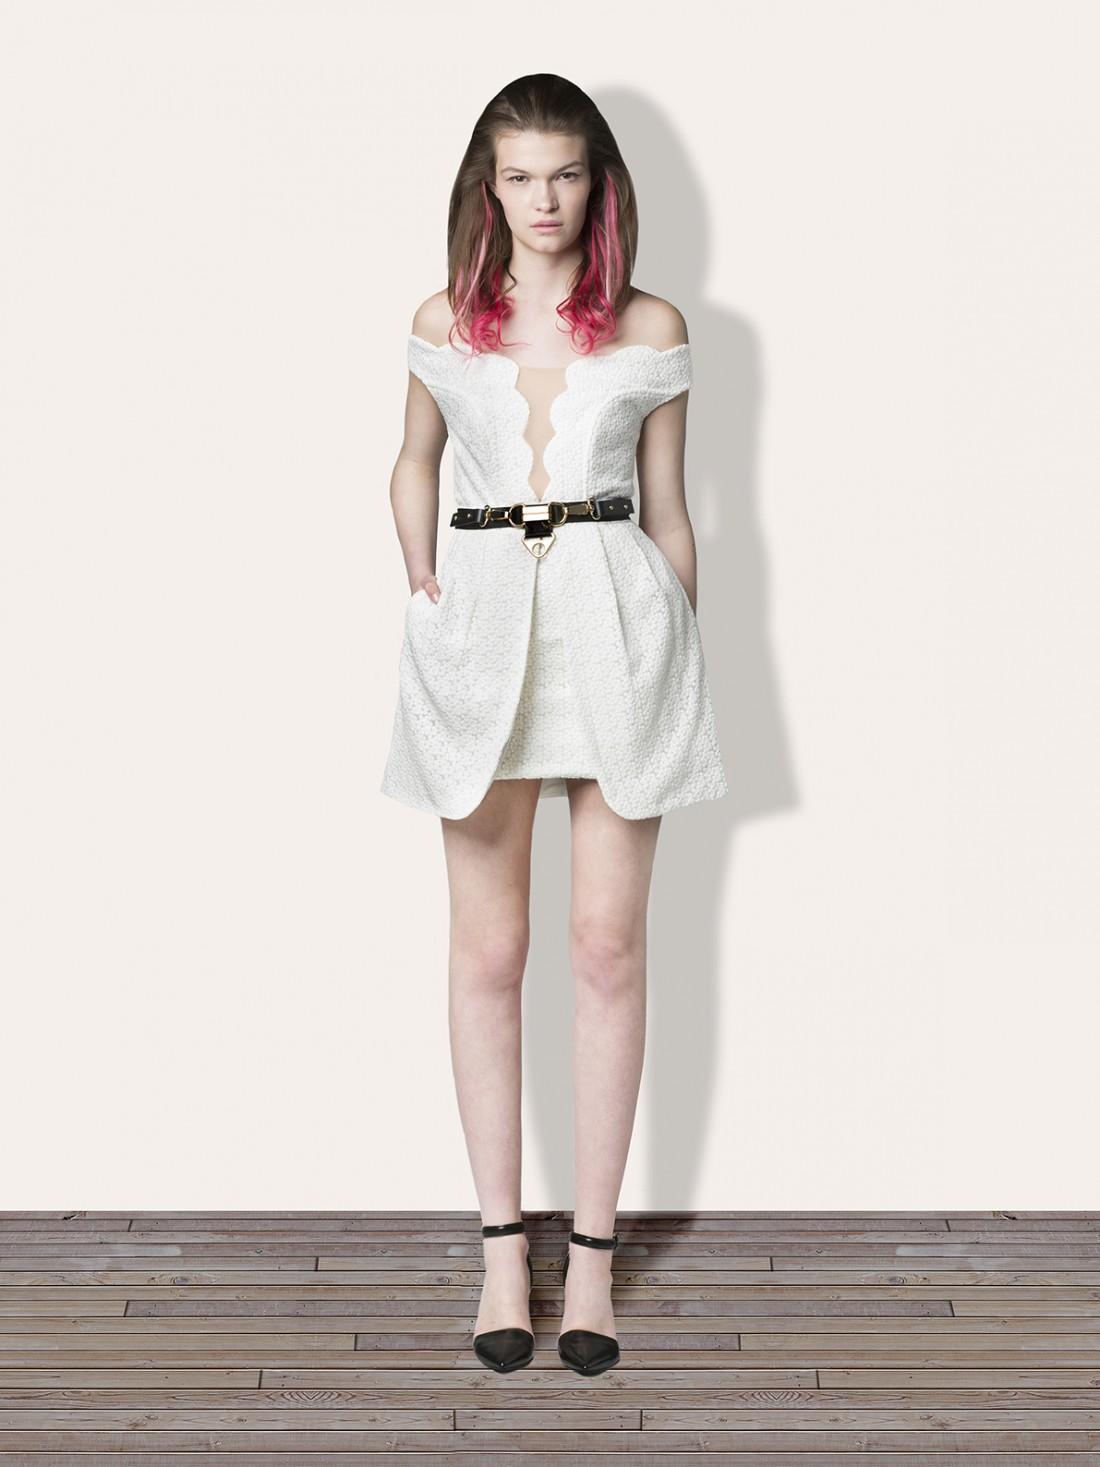 WHITE OUT Dress - Dresses Three Floor Fashion